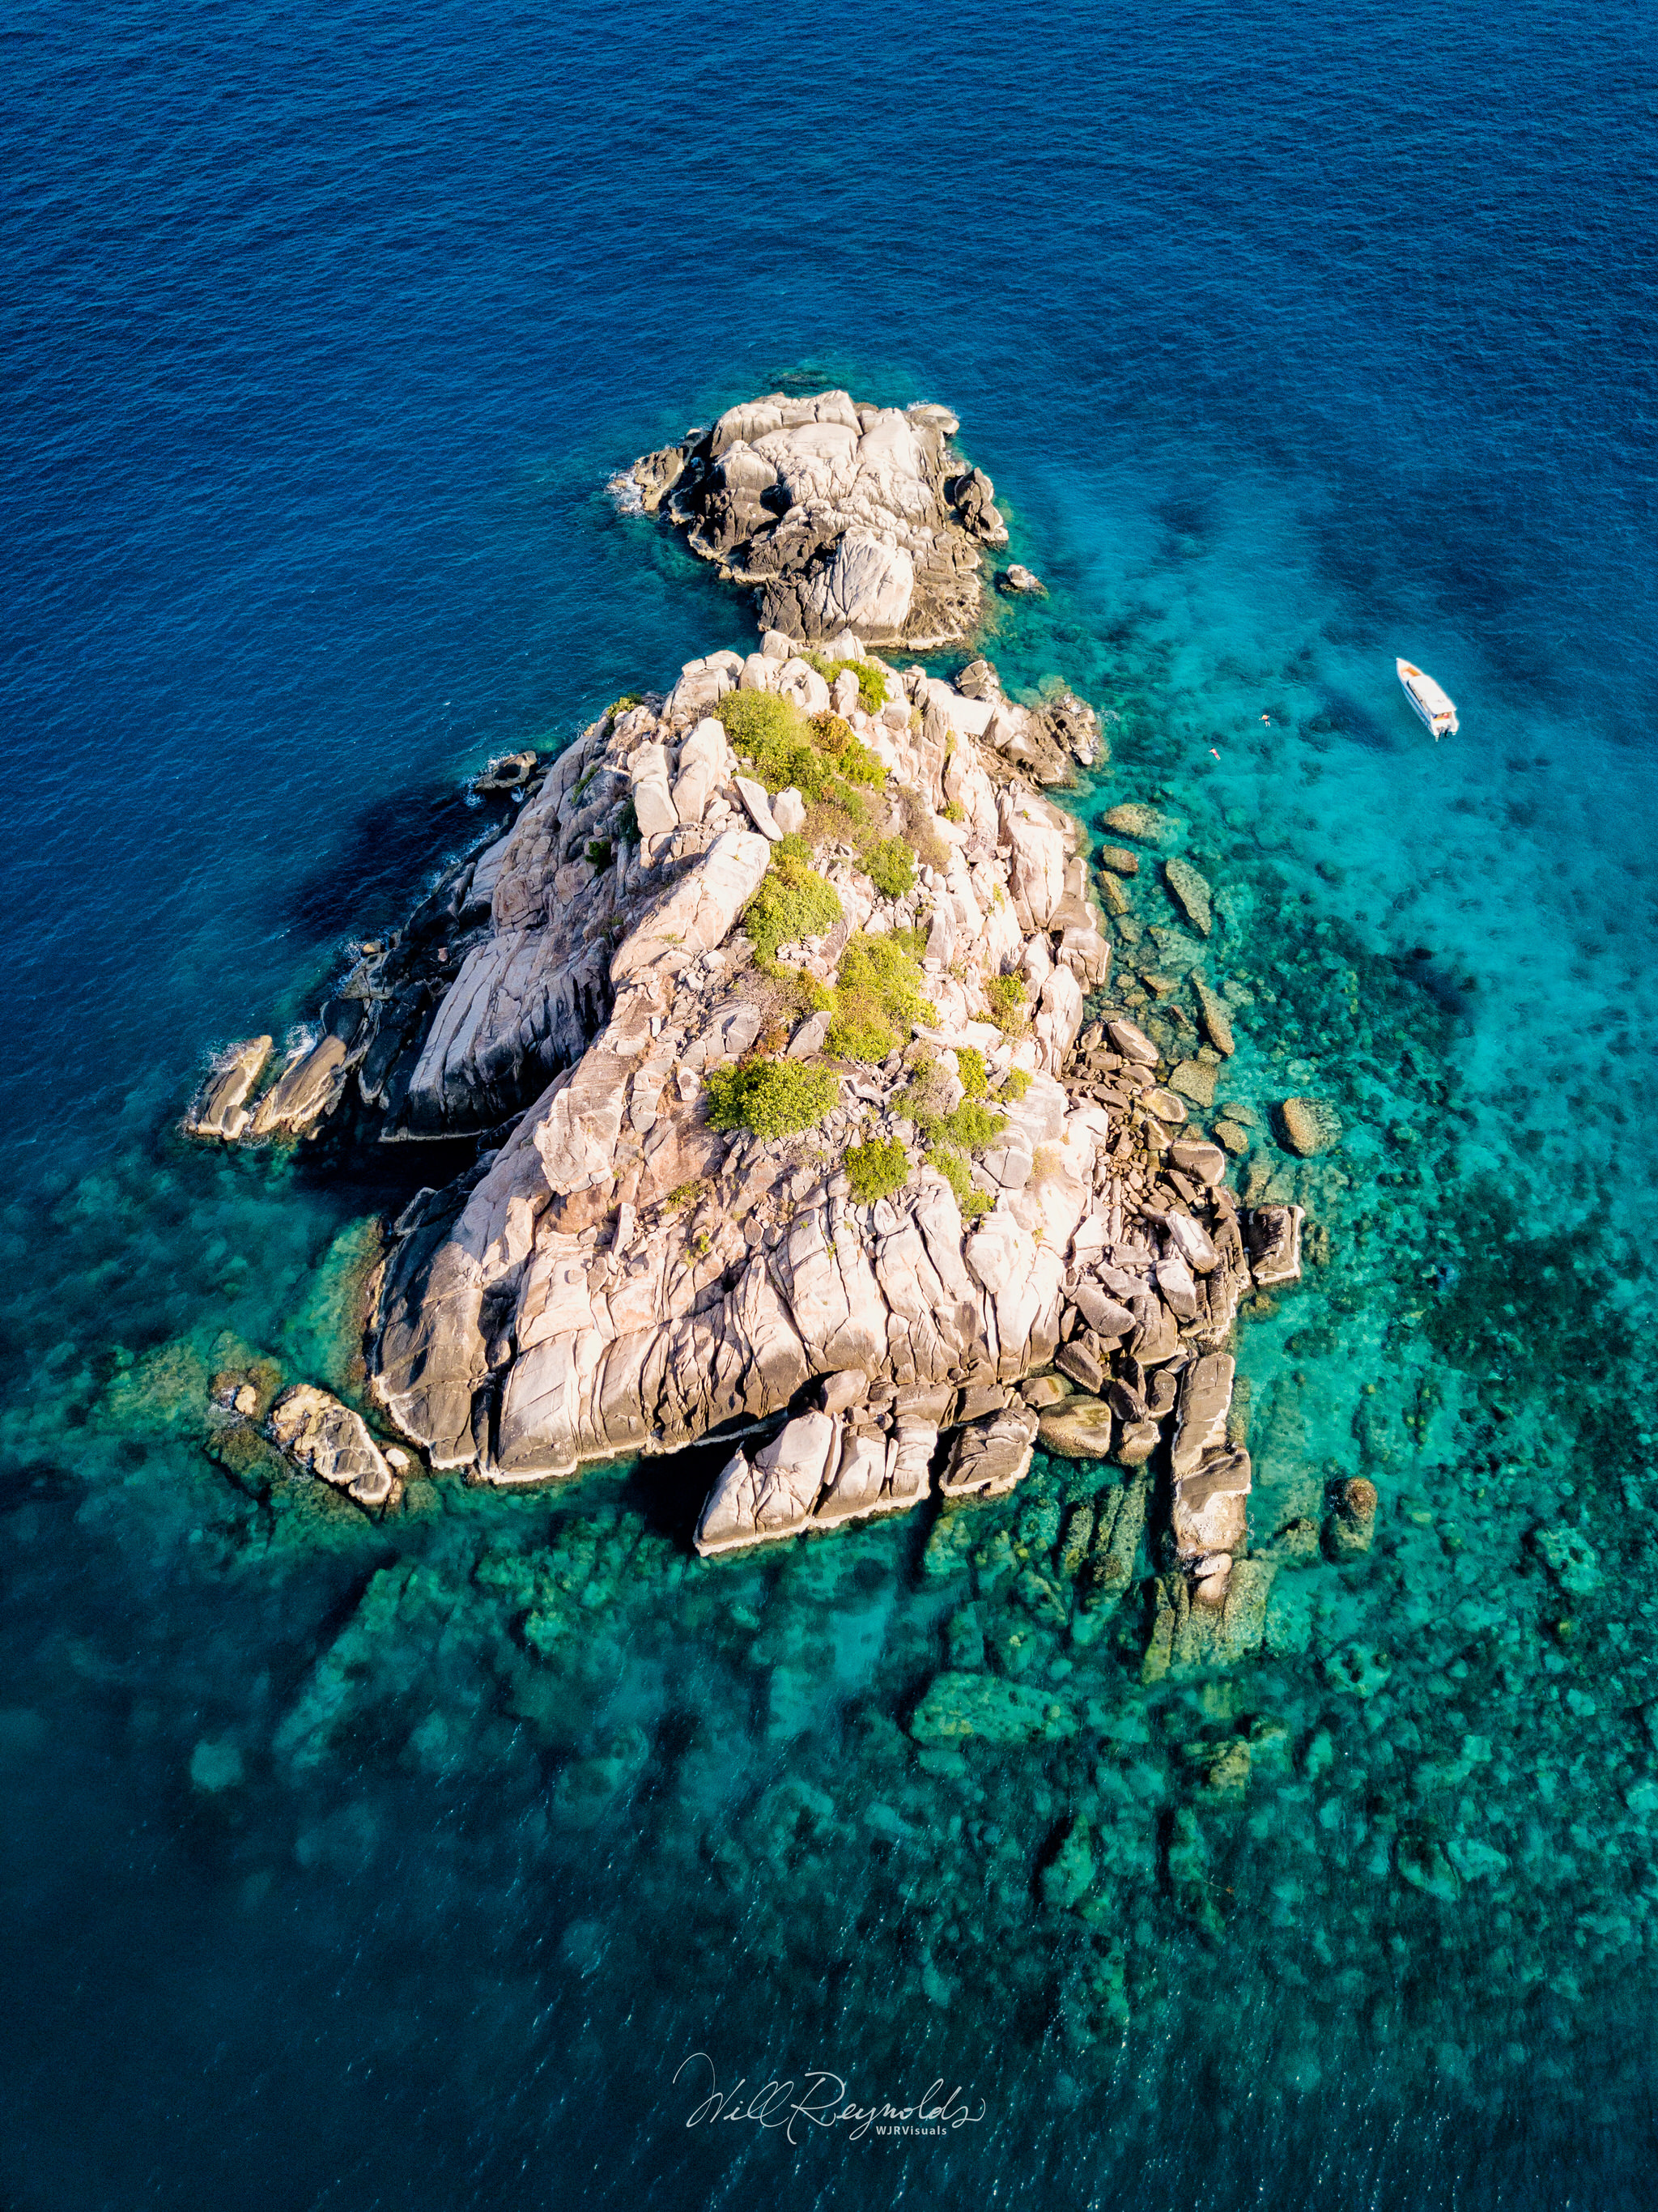 Shark Island, Koh Tao - DJI Mavic Pro